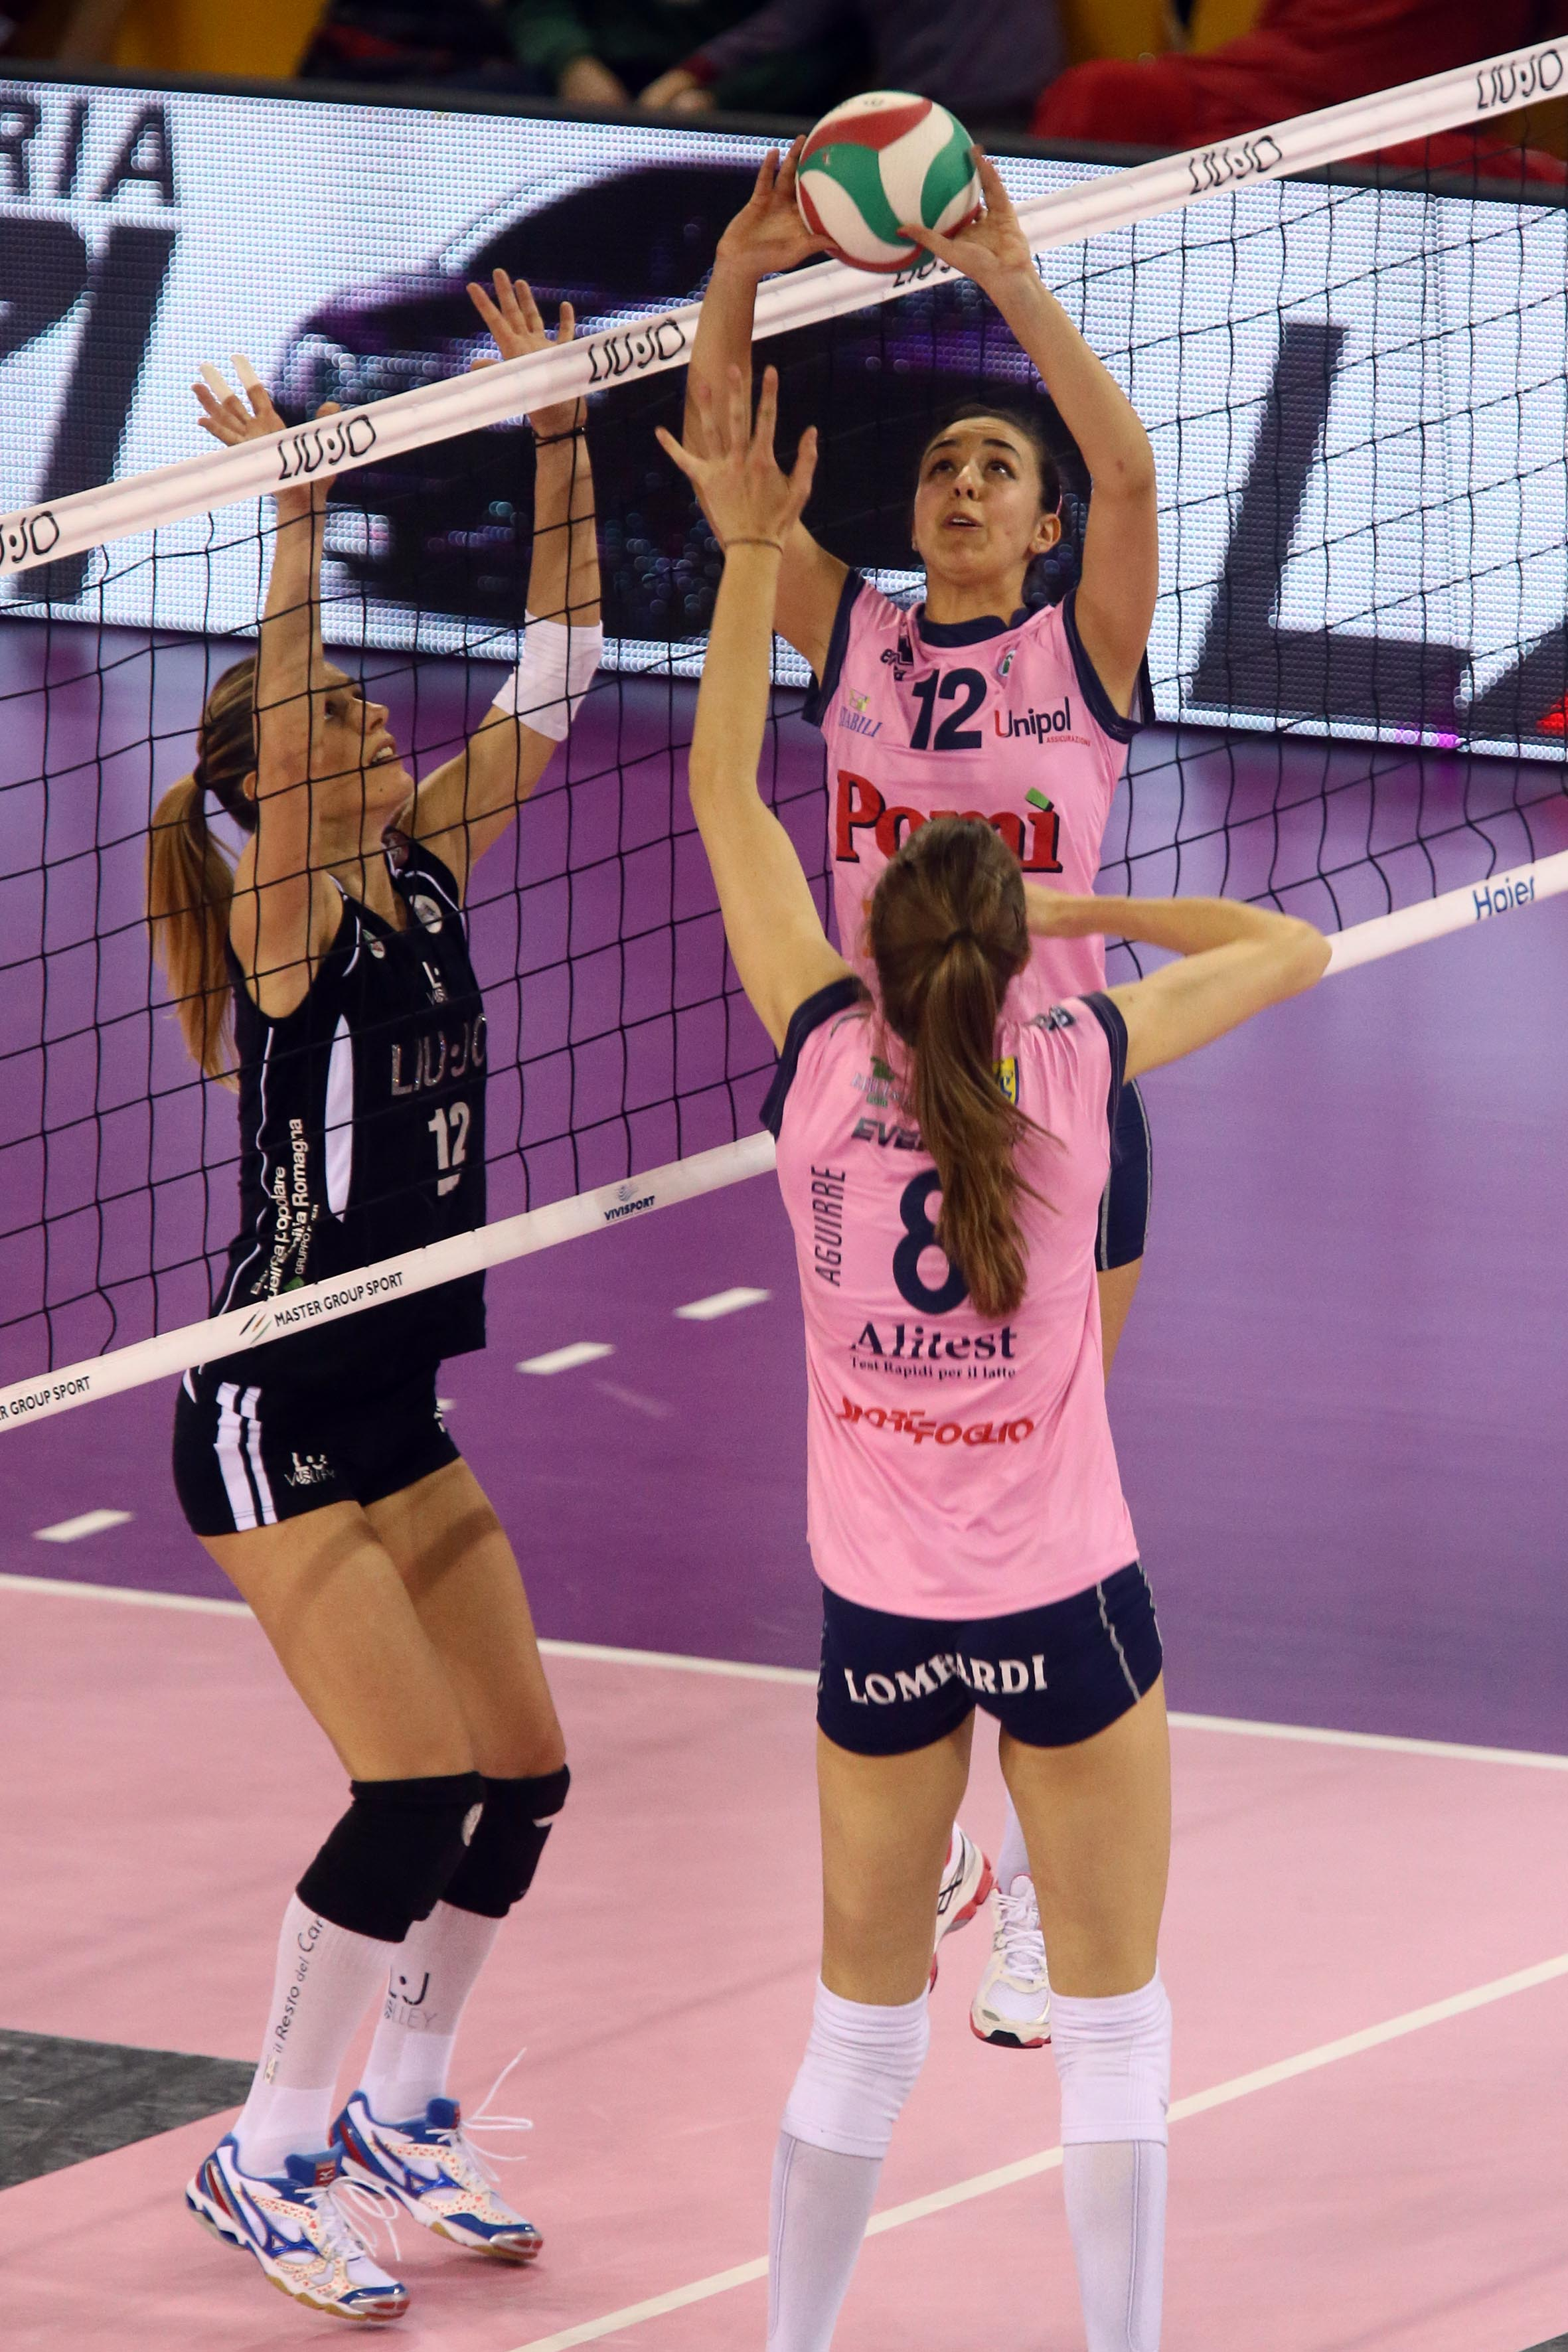 Igor Volley Calendario.Giocatrice Lega Pallavolo Serie A Femminile